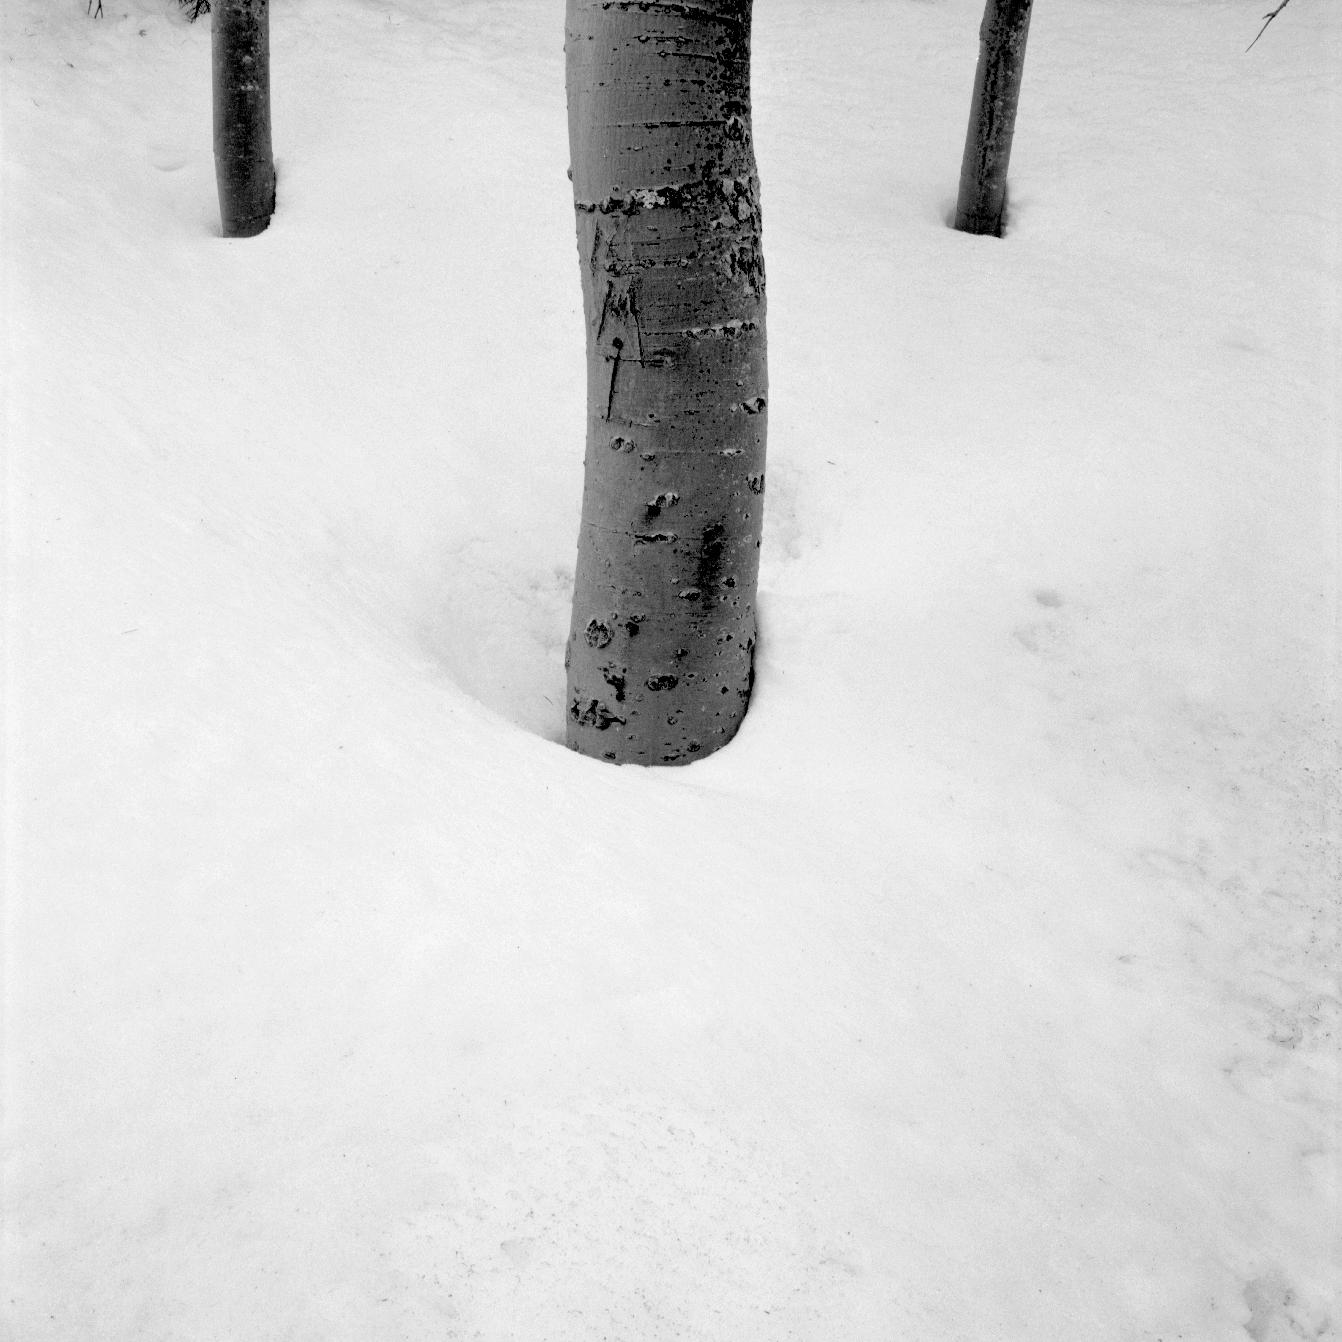 Photography by John Sykes Jr. (382)